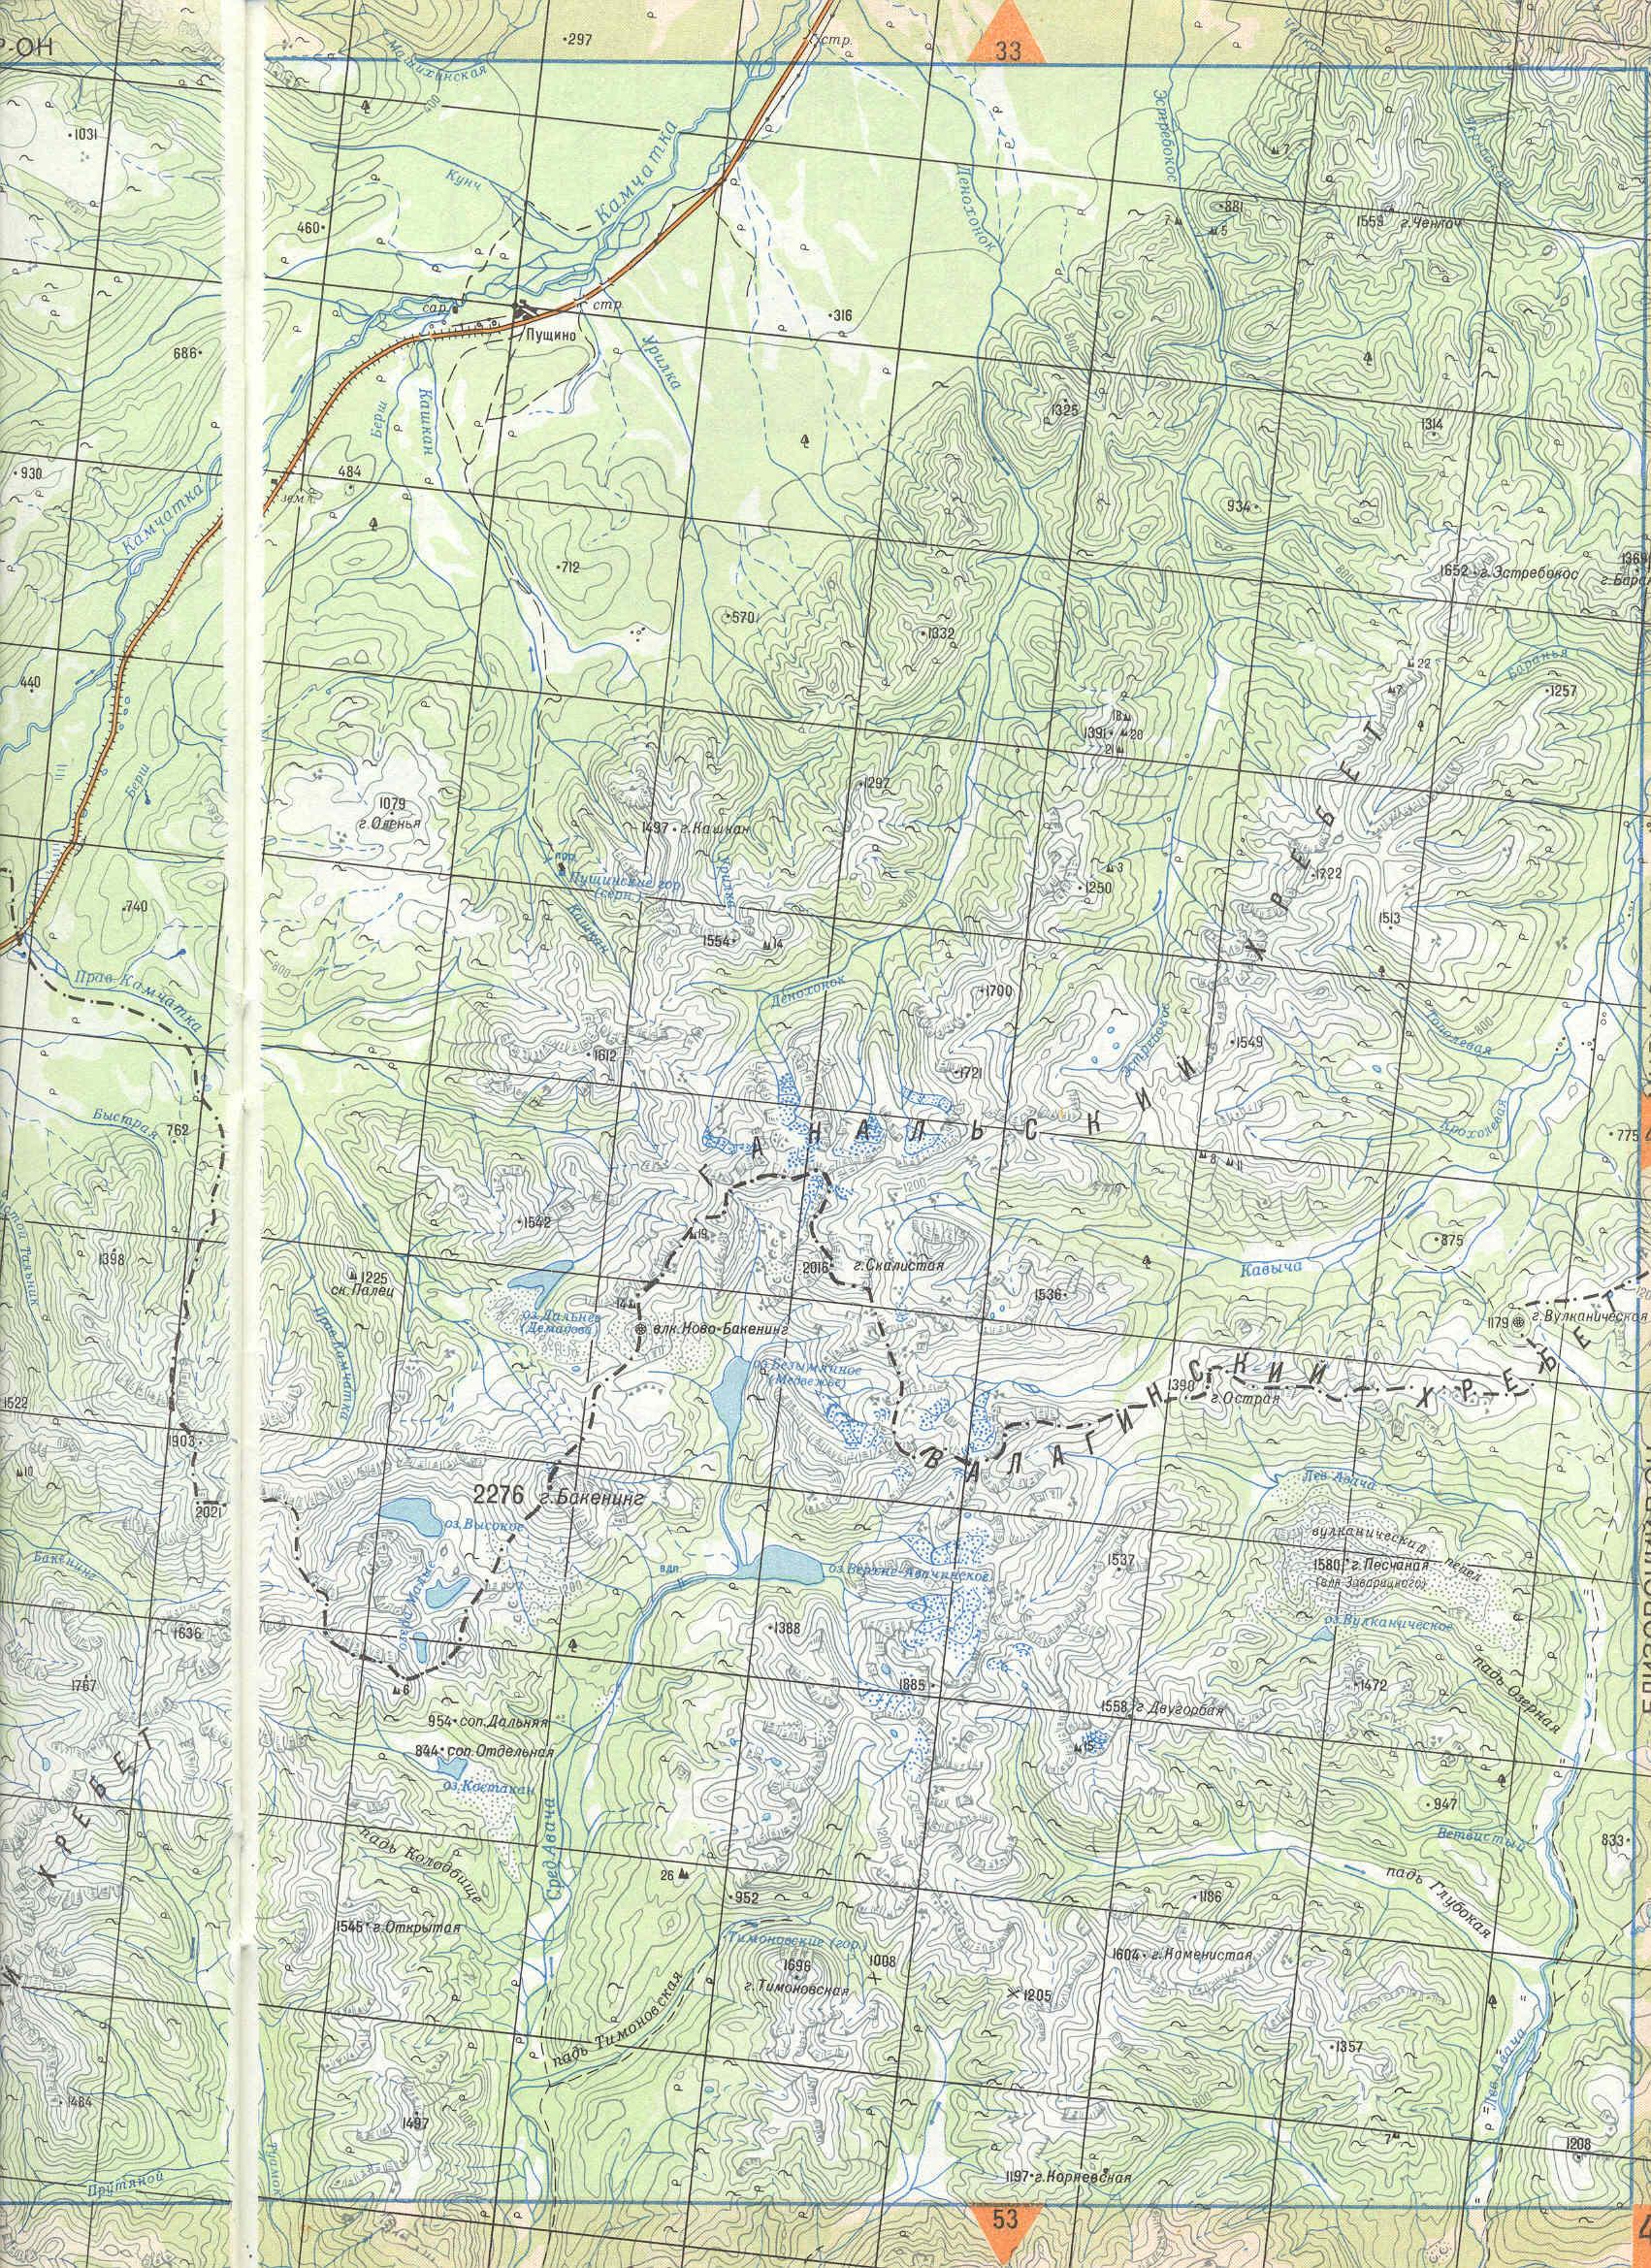 Http www fishing club ru maps kamchatka 0000 mapa45 jpg